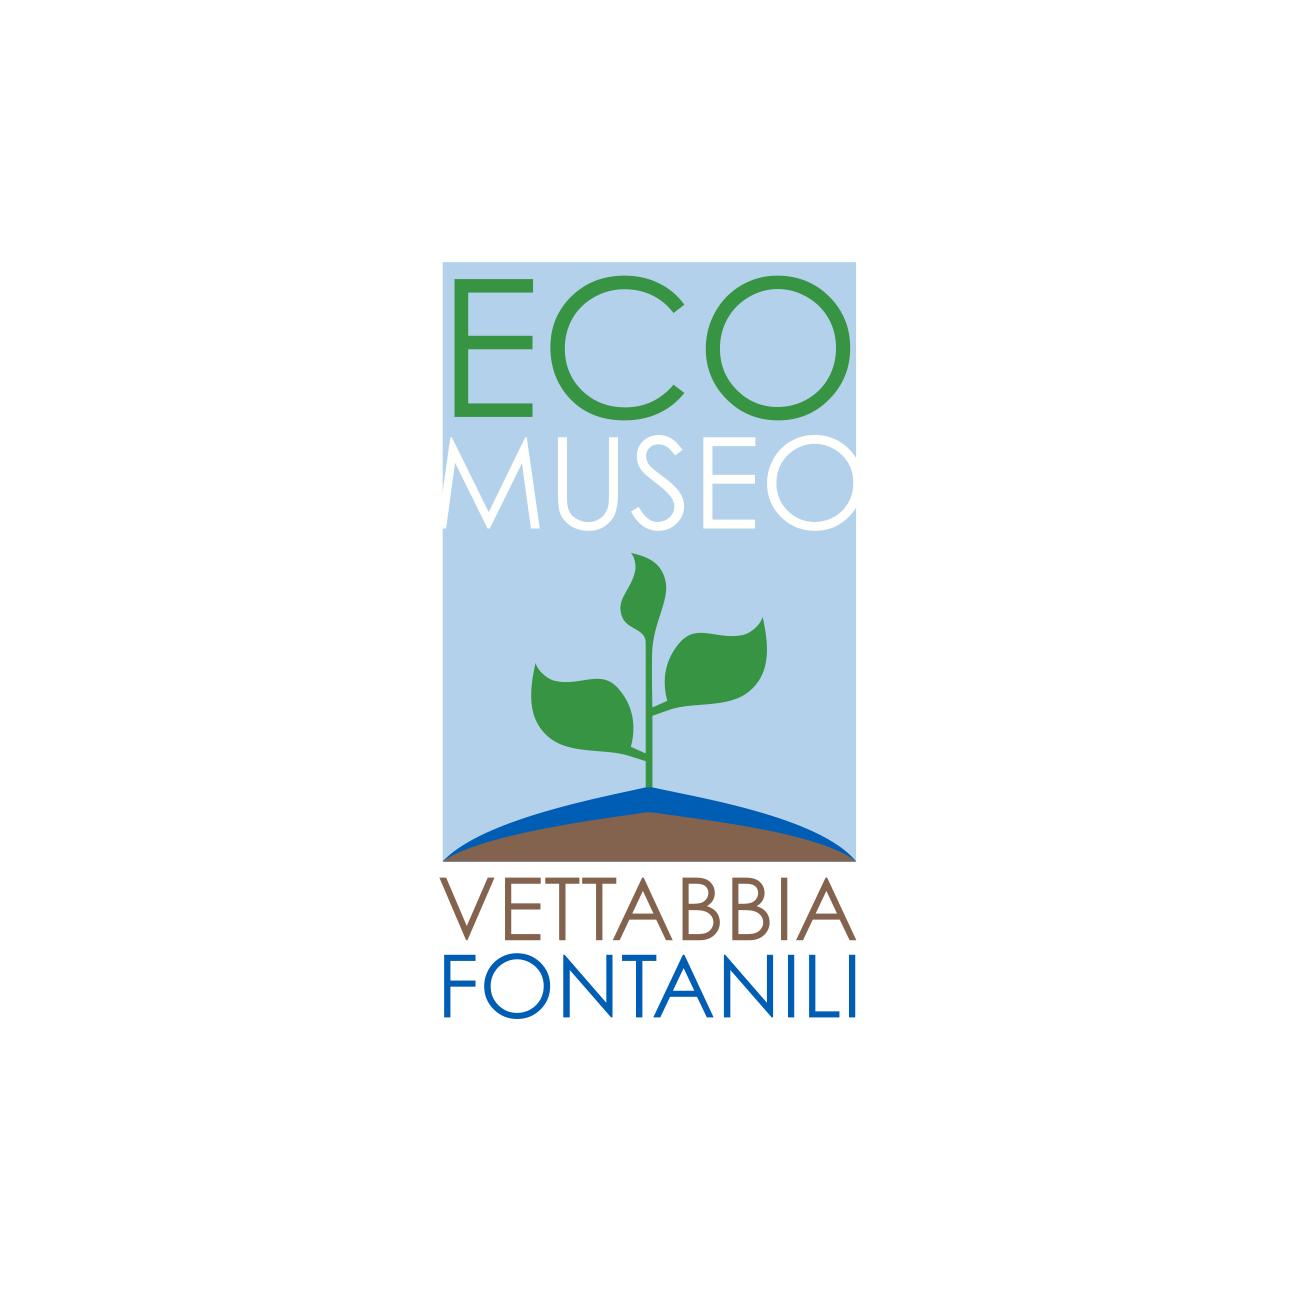 EcoMuseoVettabiaFontanili_Logo_HR